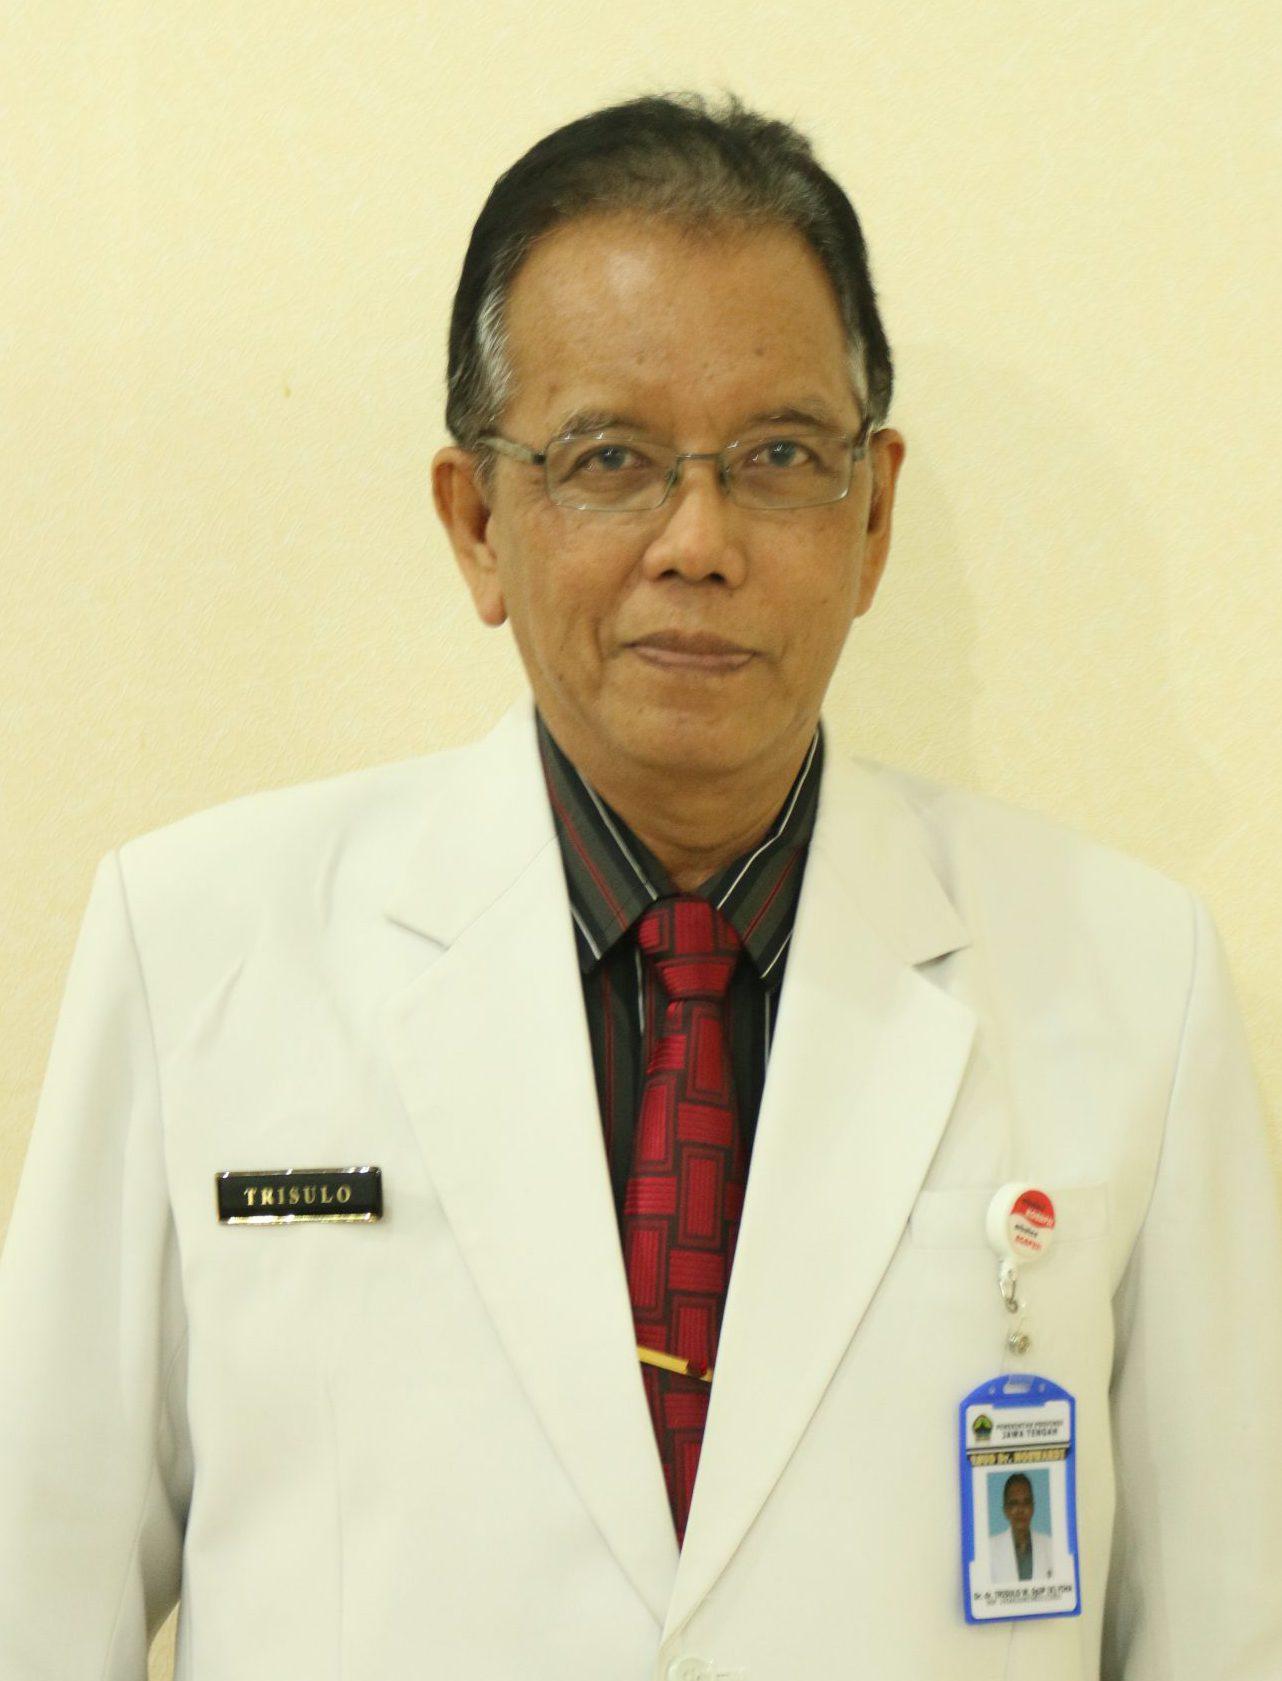 Dr. dr. Trisulo Wasyanto, SpJP(K), FIHA, FAPSC, FAsCC